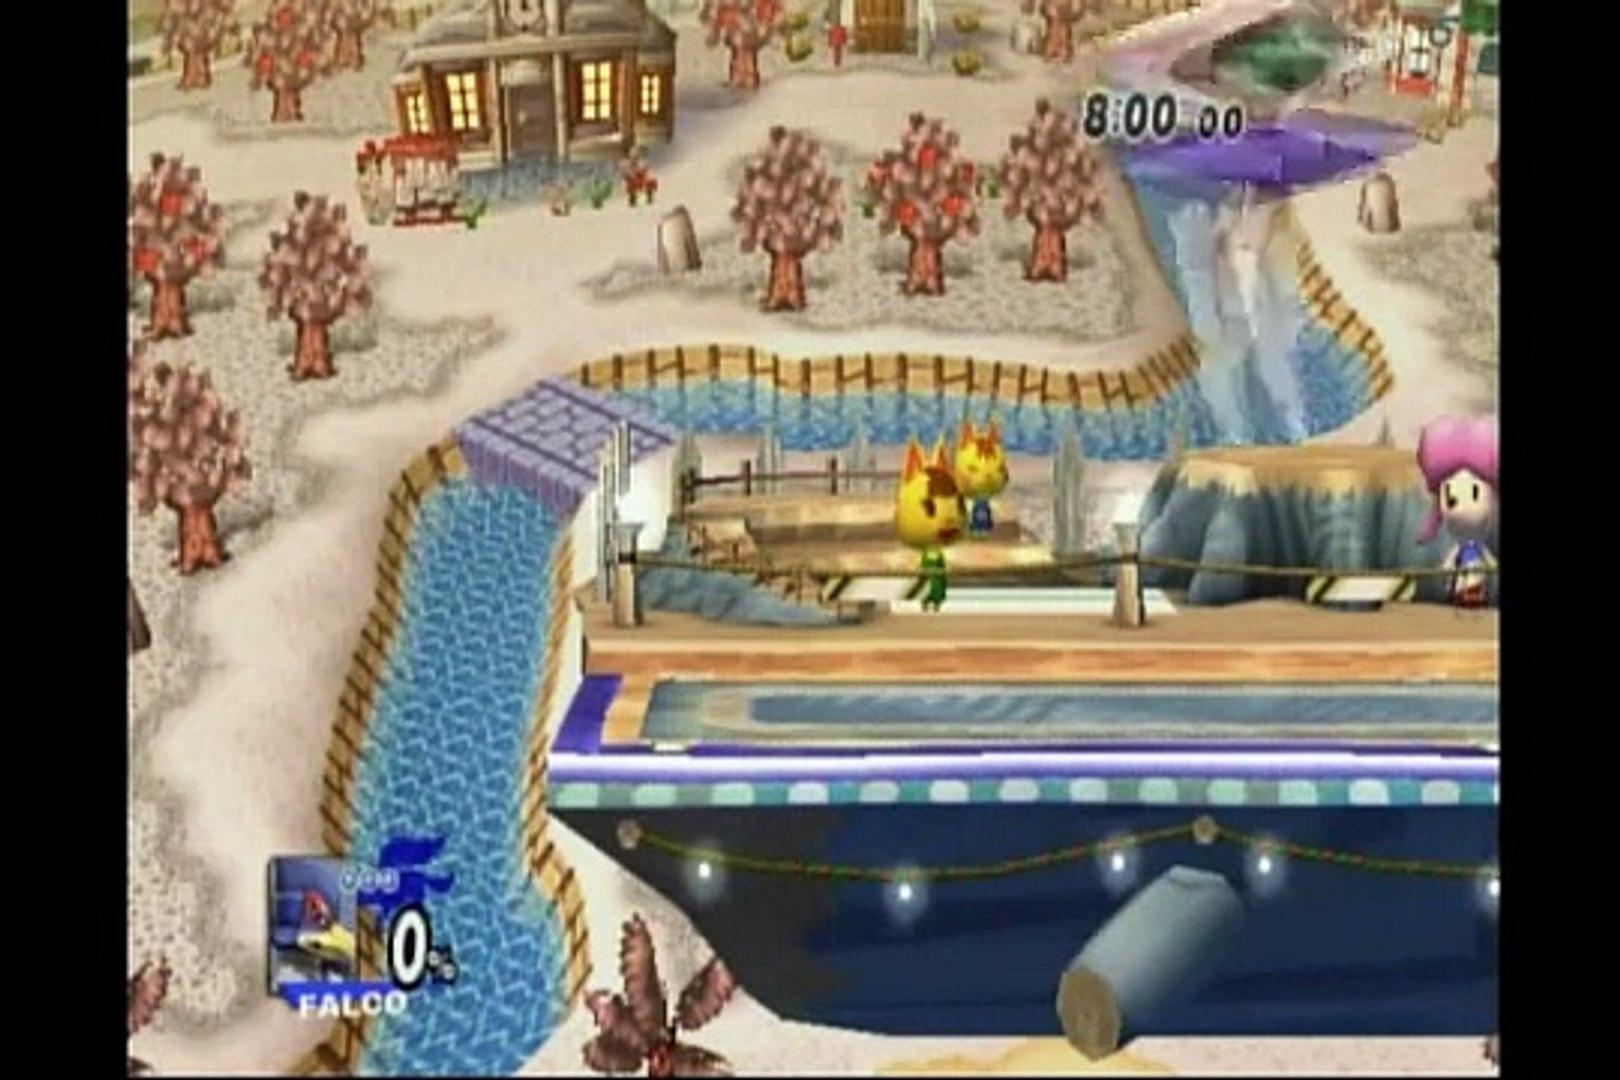 Zero Ping: DJ Jack (Falco) & Waft-OLi (Falco) vs. Kith (Pokemon Trainer) & Gan (Link) 5